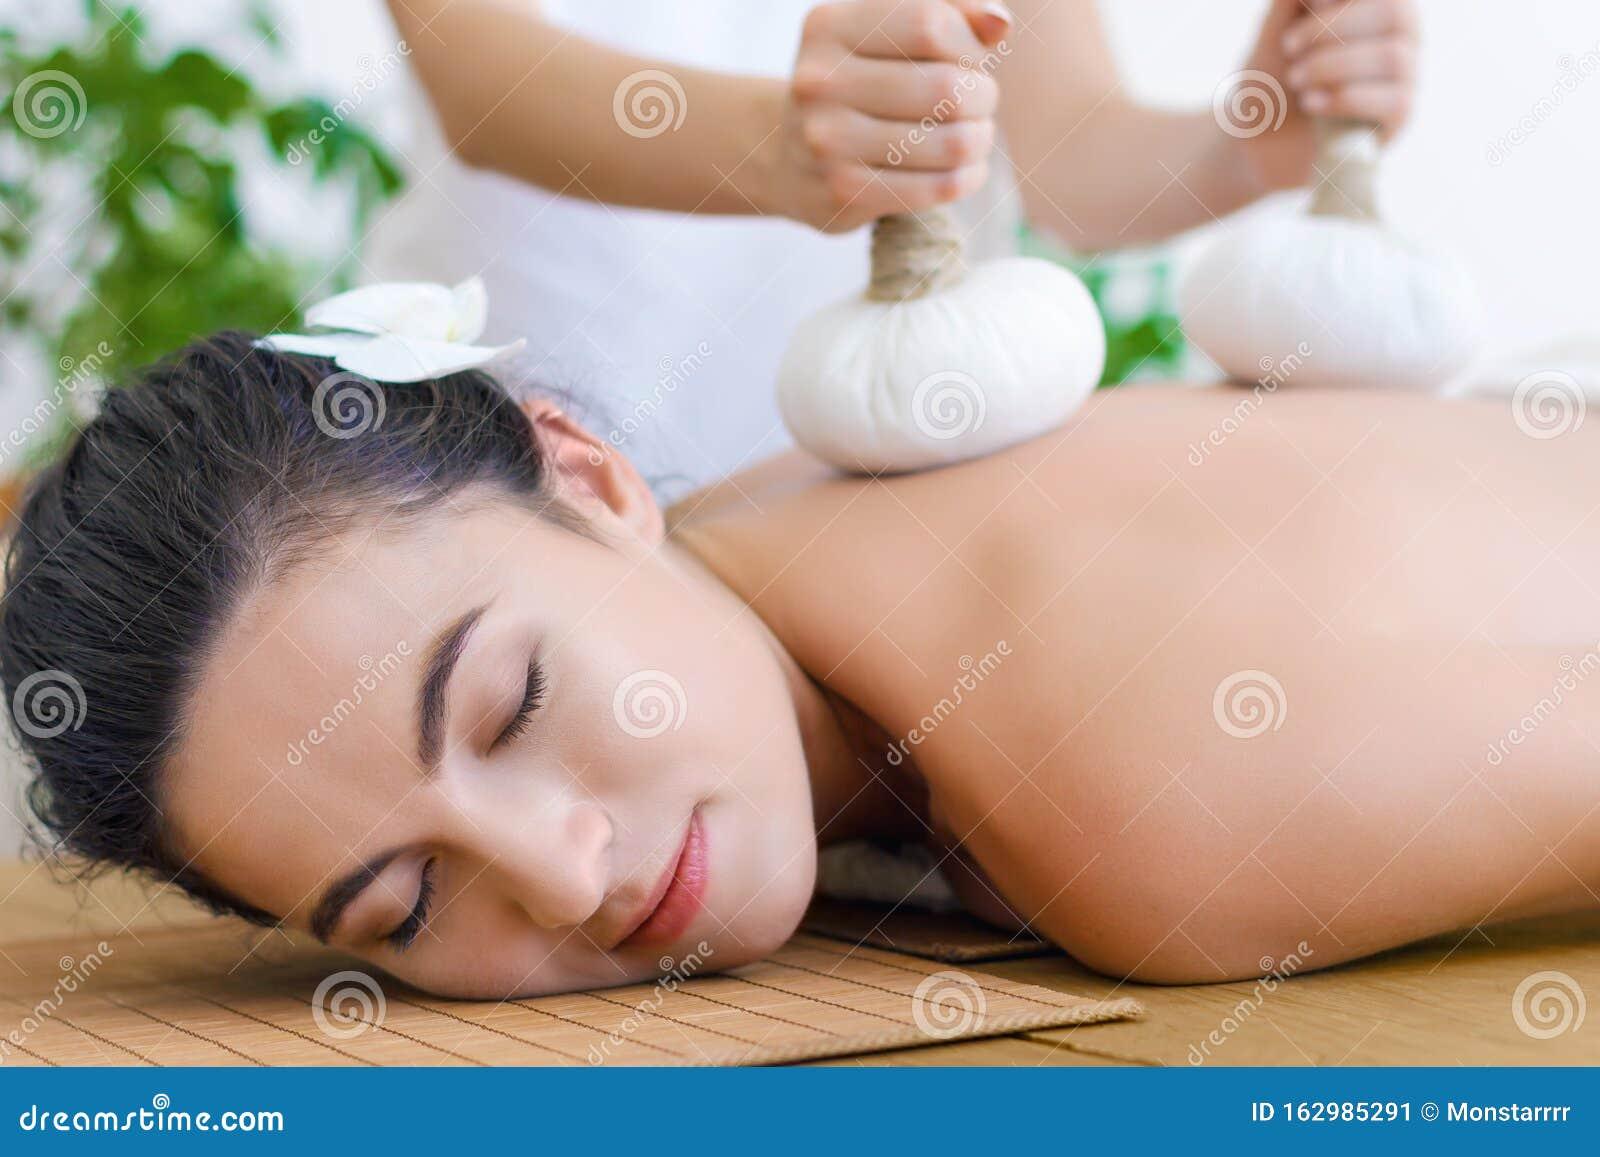 Massage Therapists Explain How Thai Massage Helps Reduce Pain